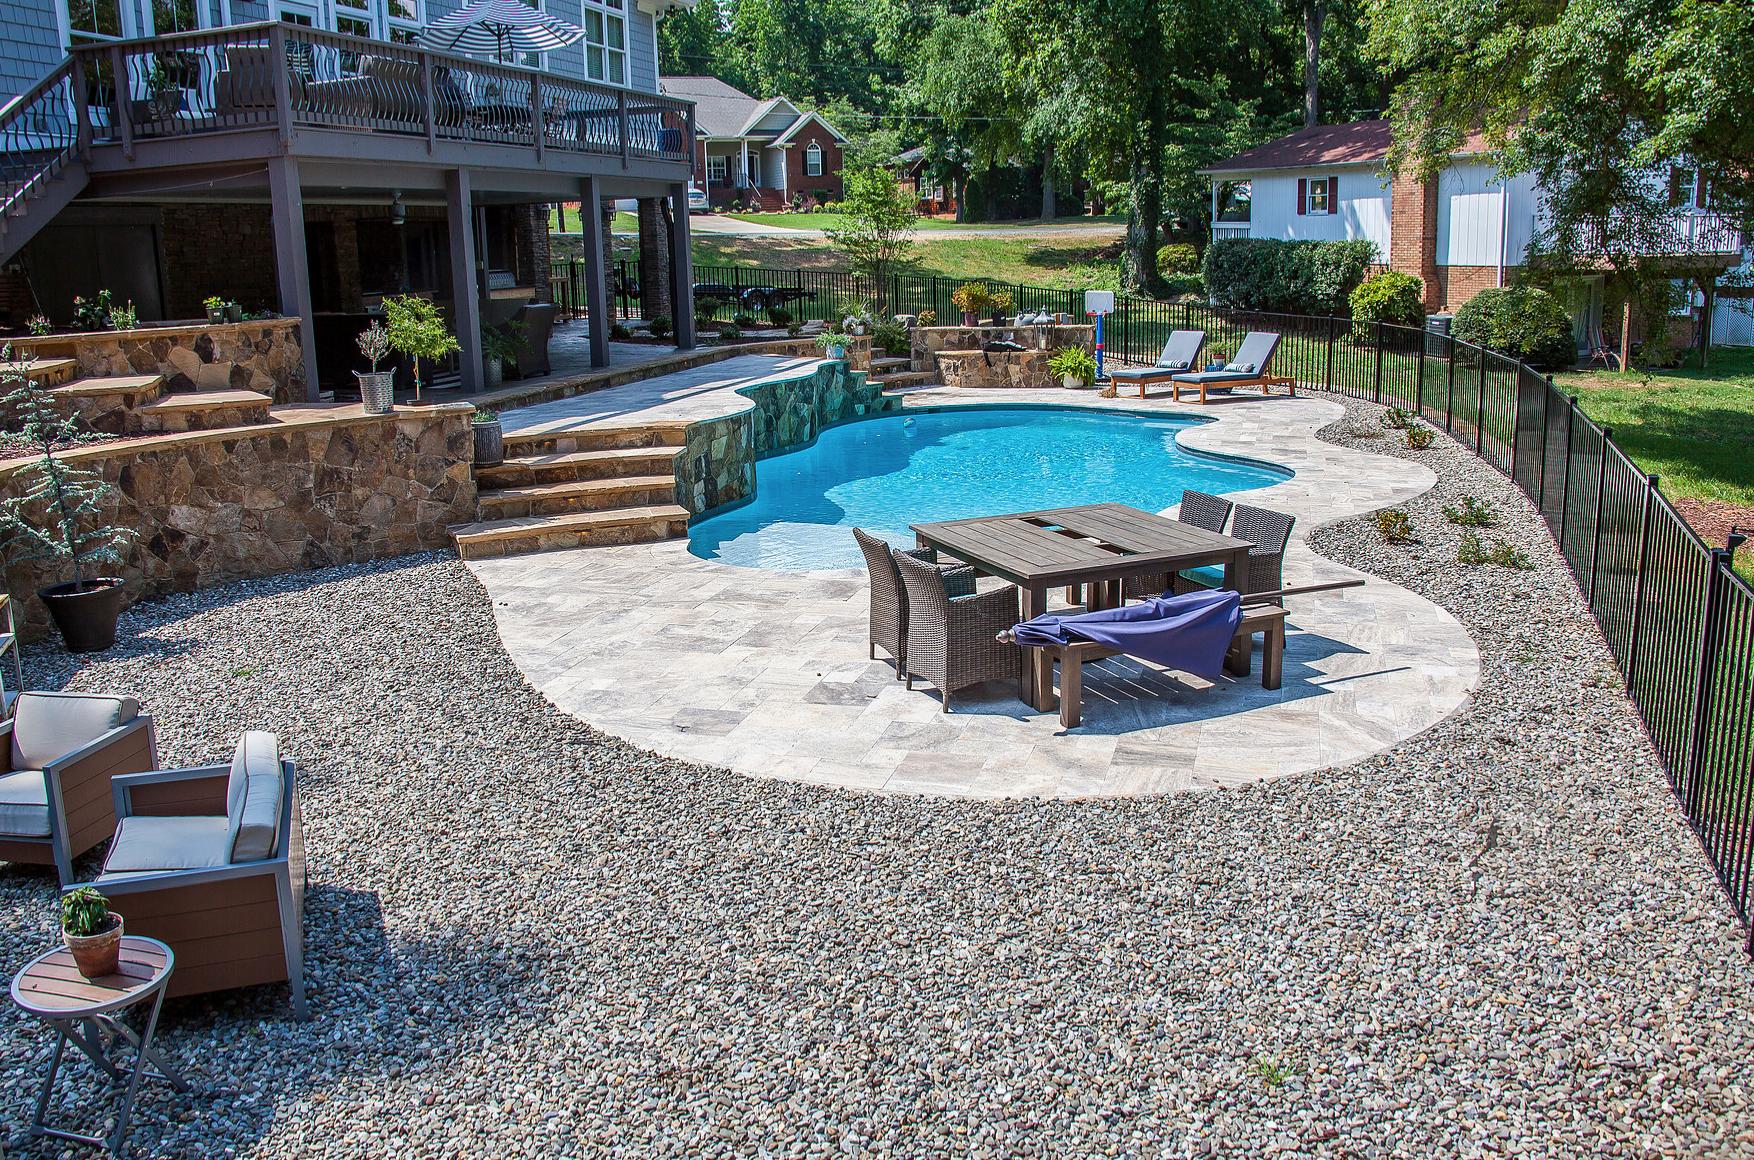 Cornelius North Carolina Custom Inground Concrete Pools from CPC Pools Call 704-799-5236